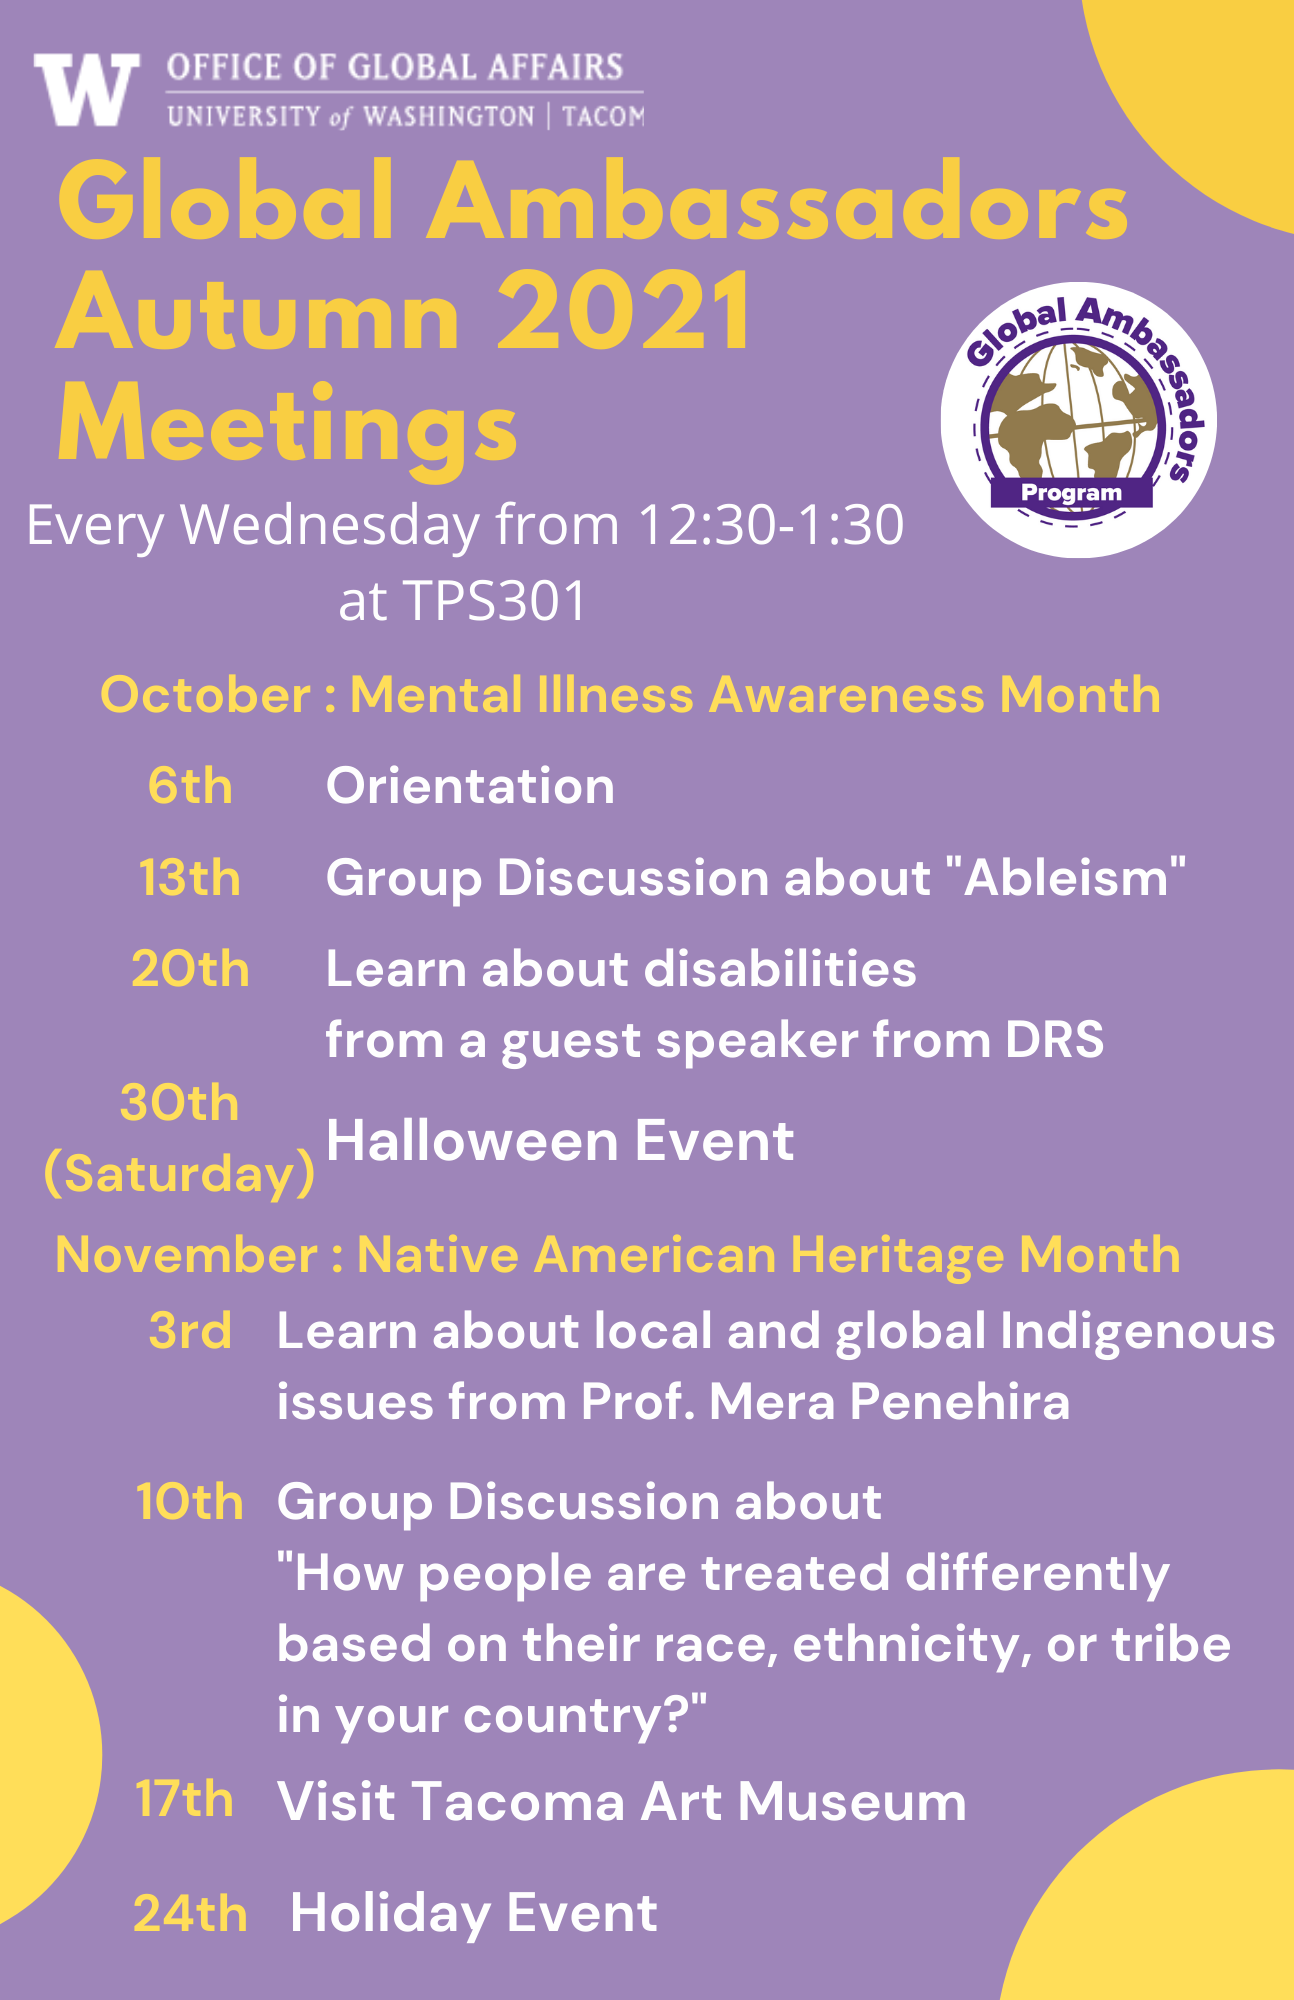 Global Ambassadors Autumn meetings schedule